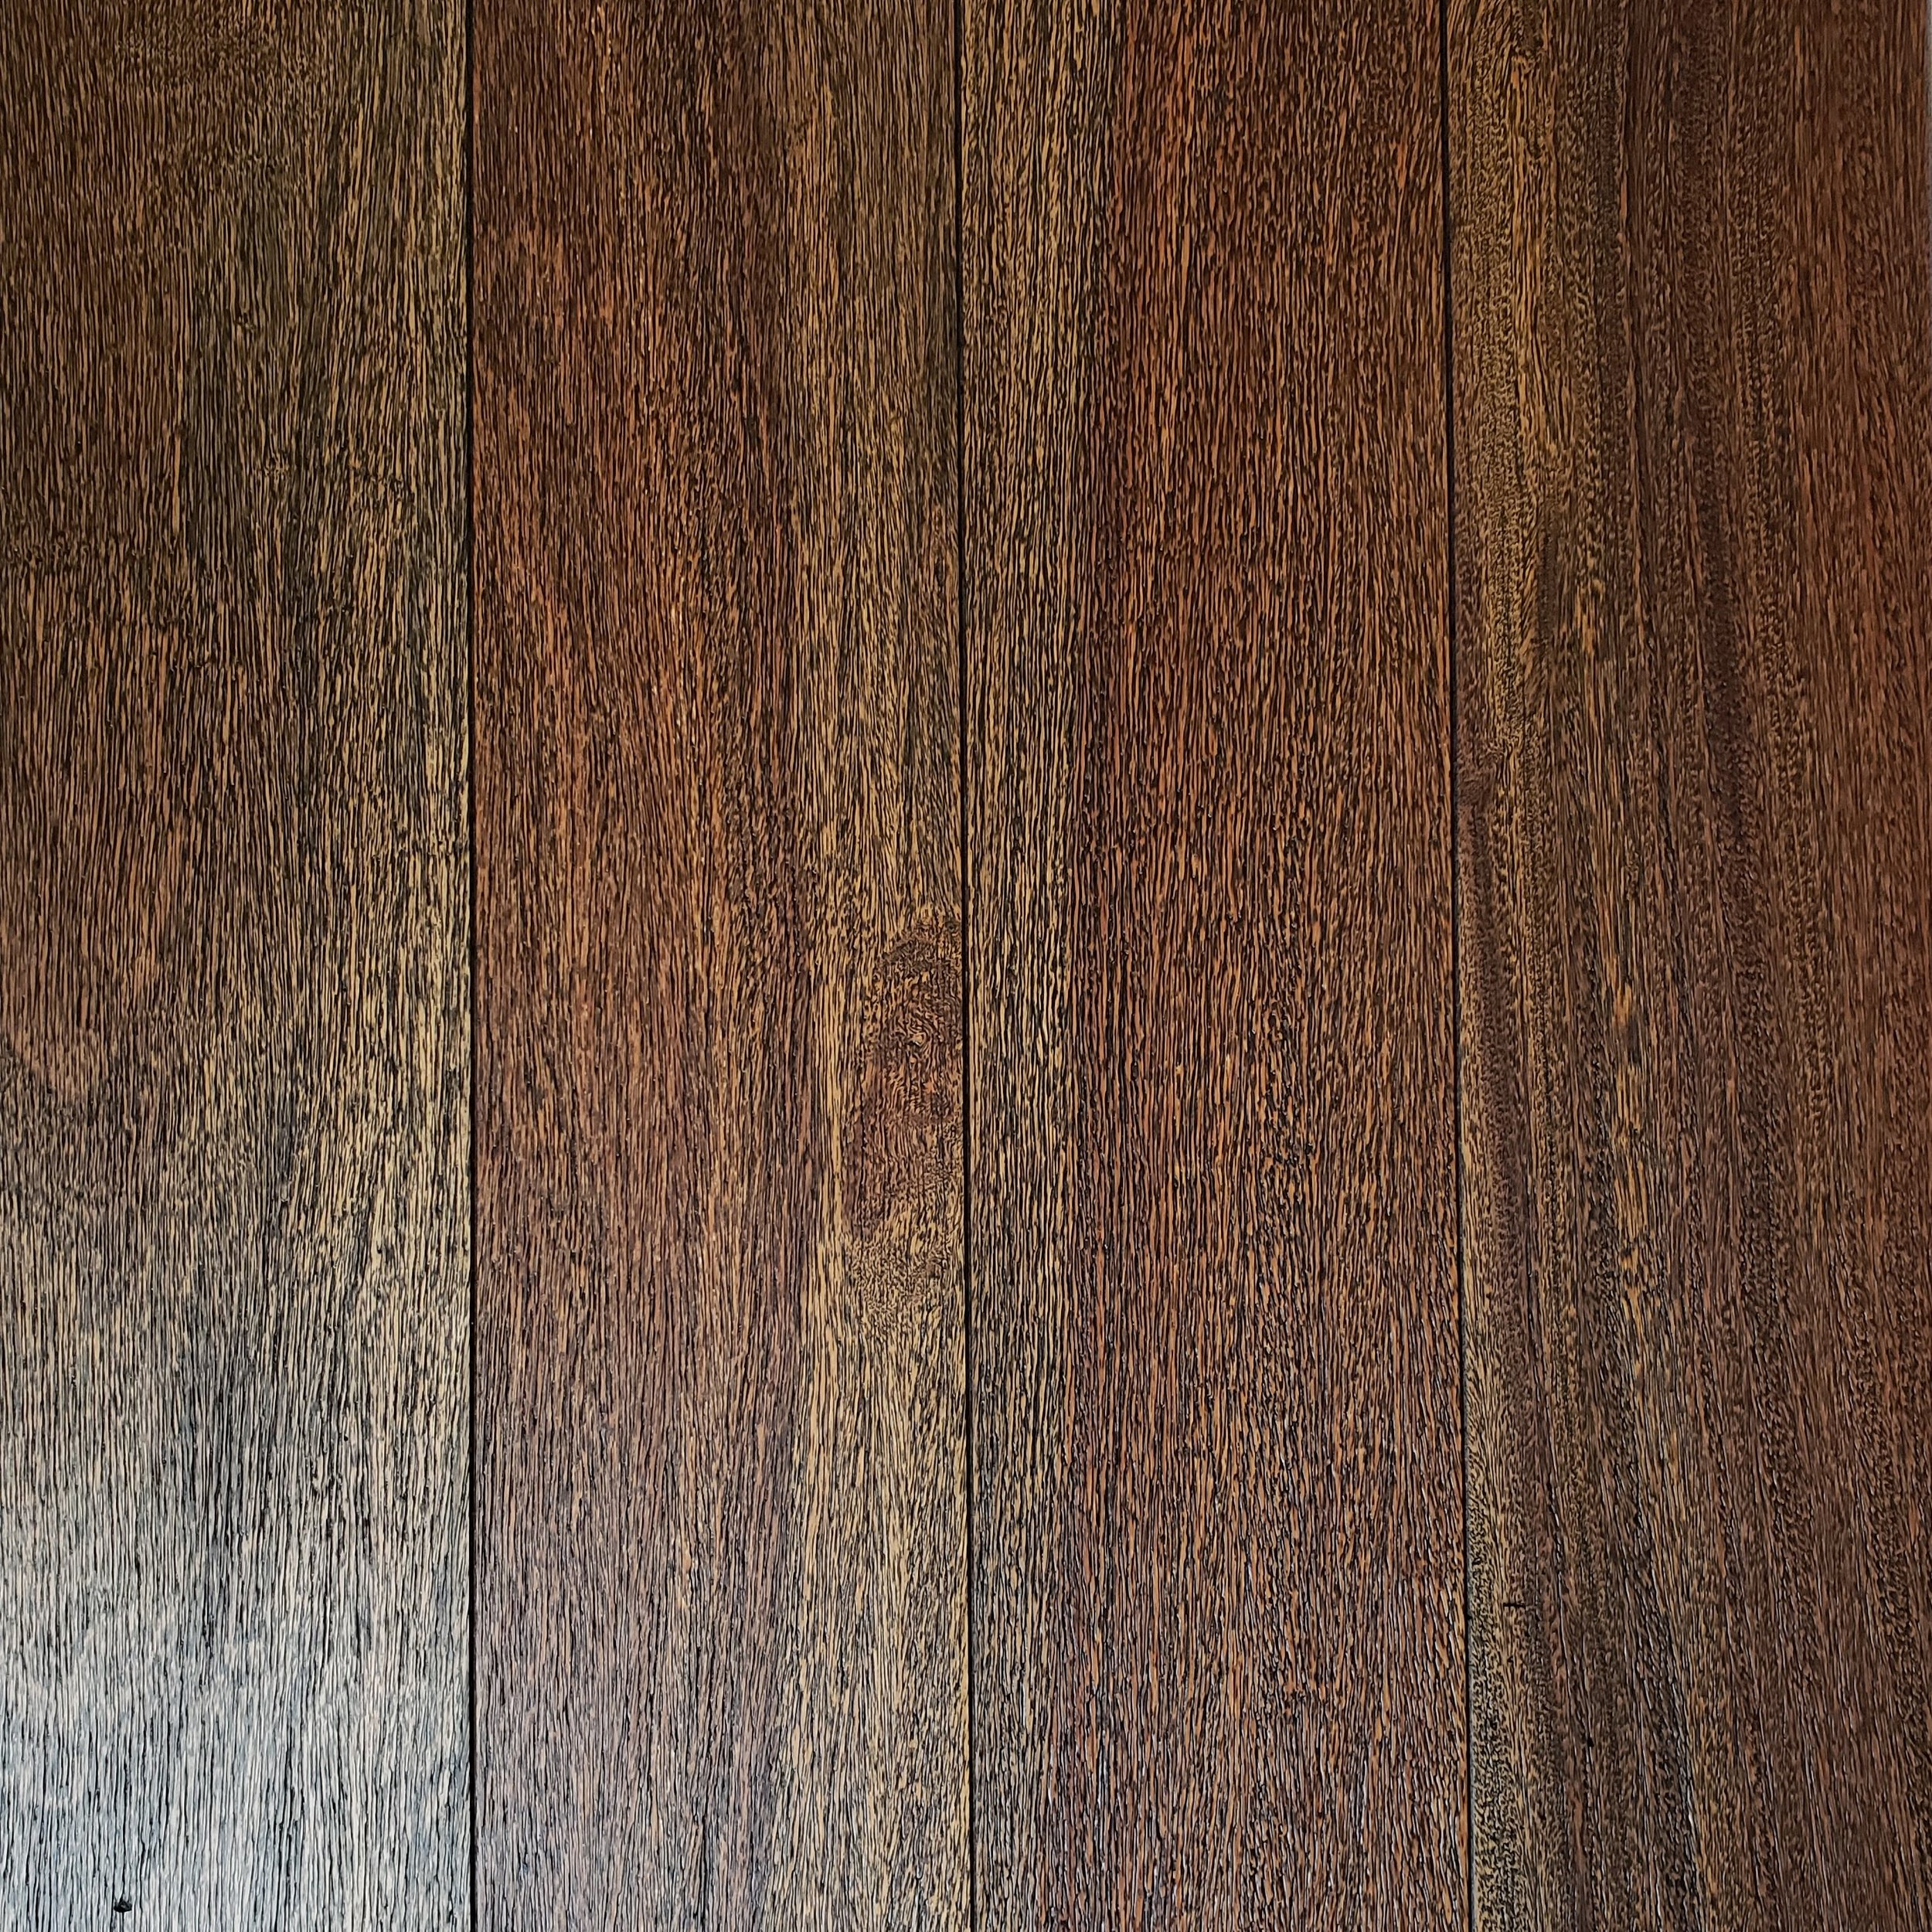 brazilian teak (cumaru) Wirebrushed - millwood